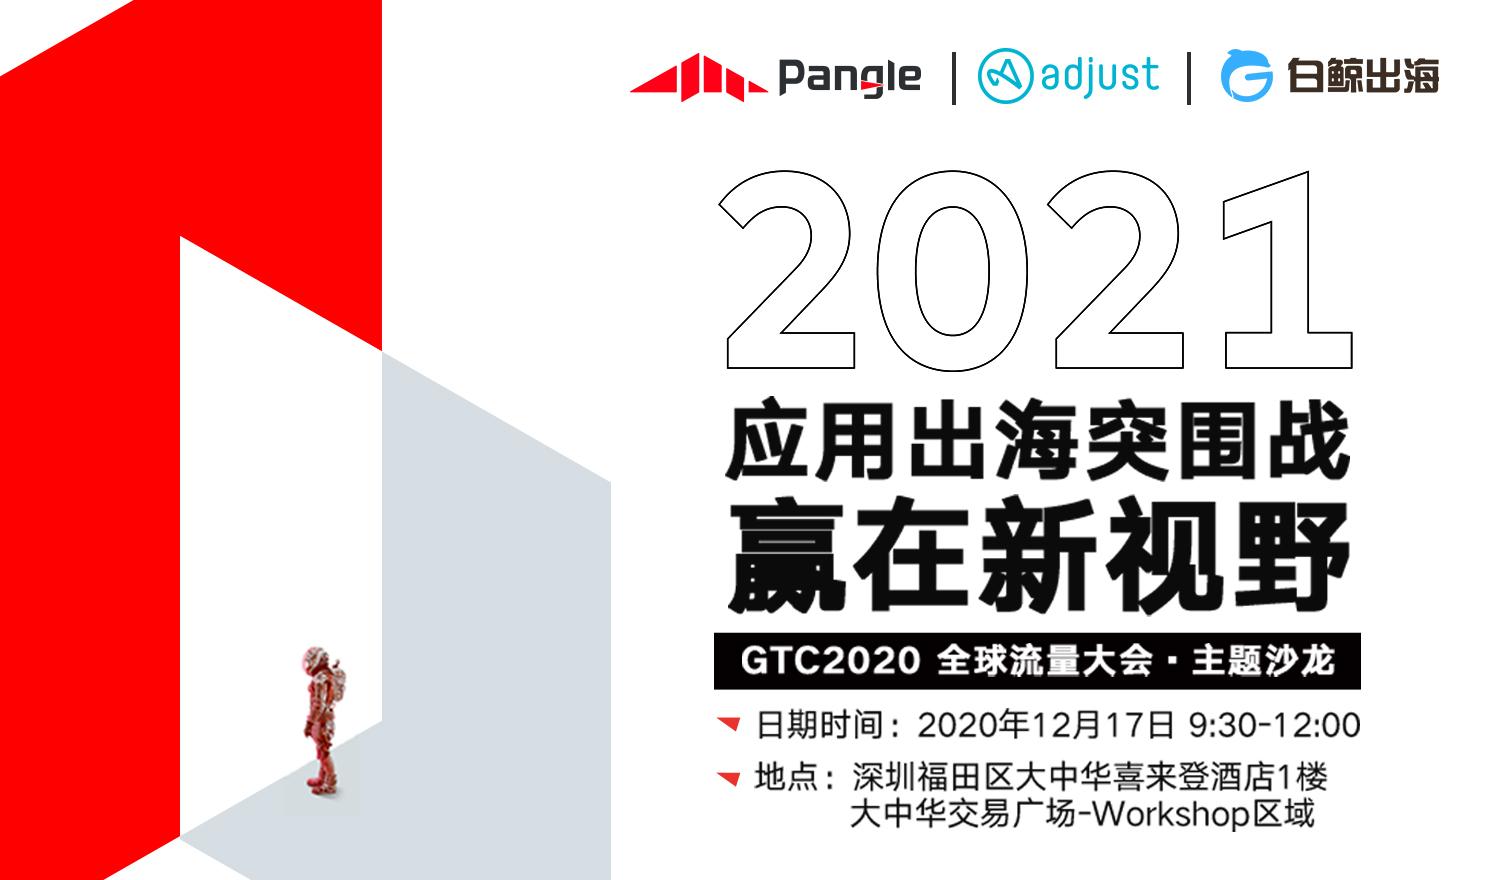 GTC2020-全球流量大会Workshop上午场-2021应用出海突围战 赢在新视野!(2020-12-17)